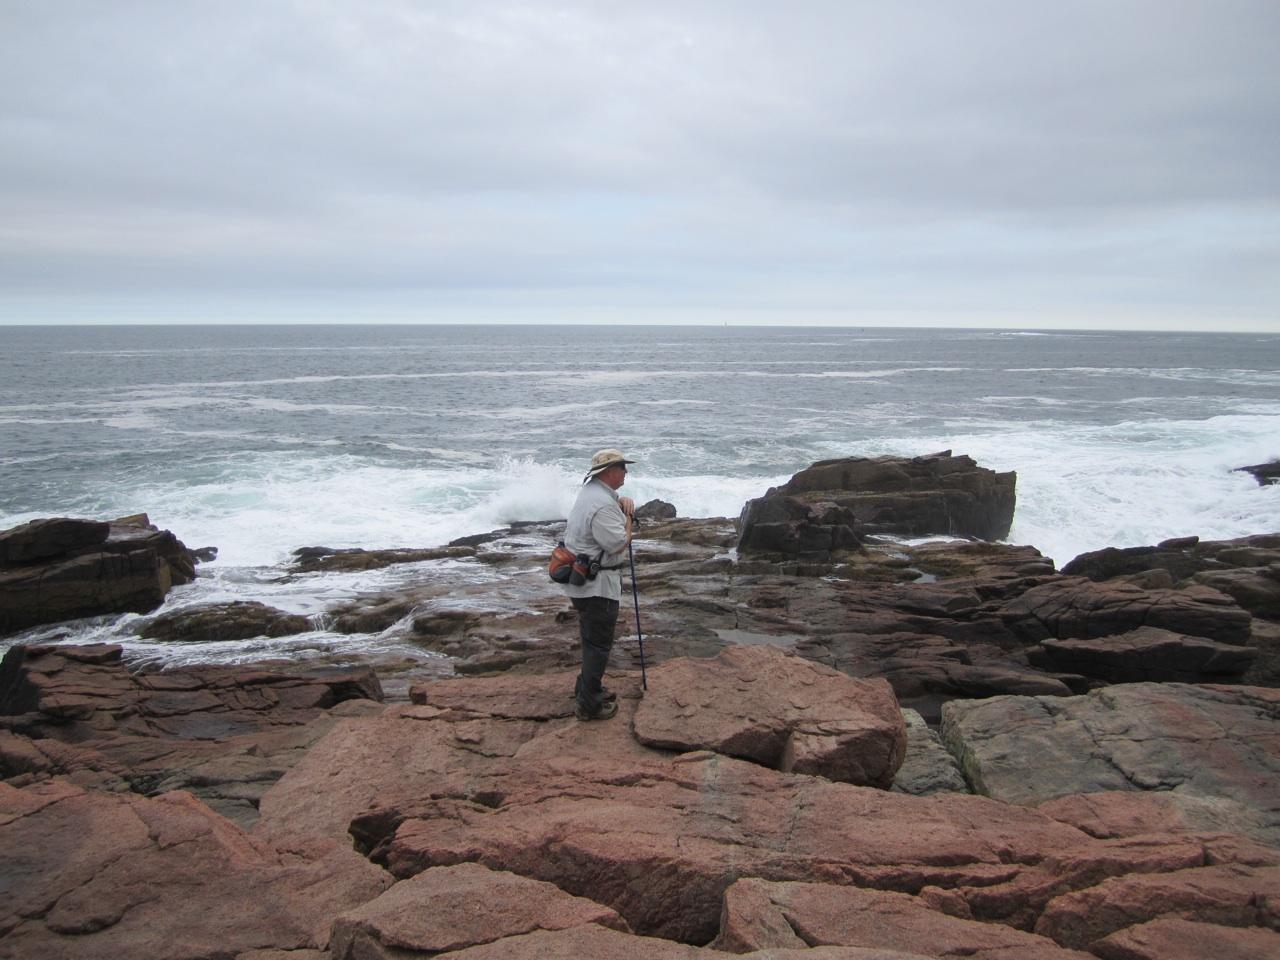 David Hiking On Boulders